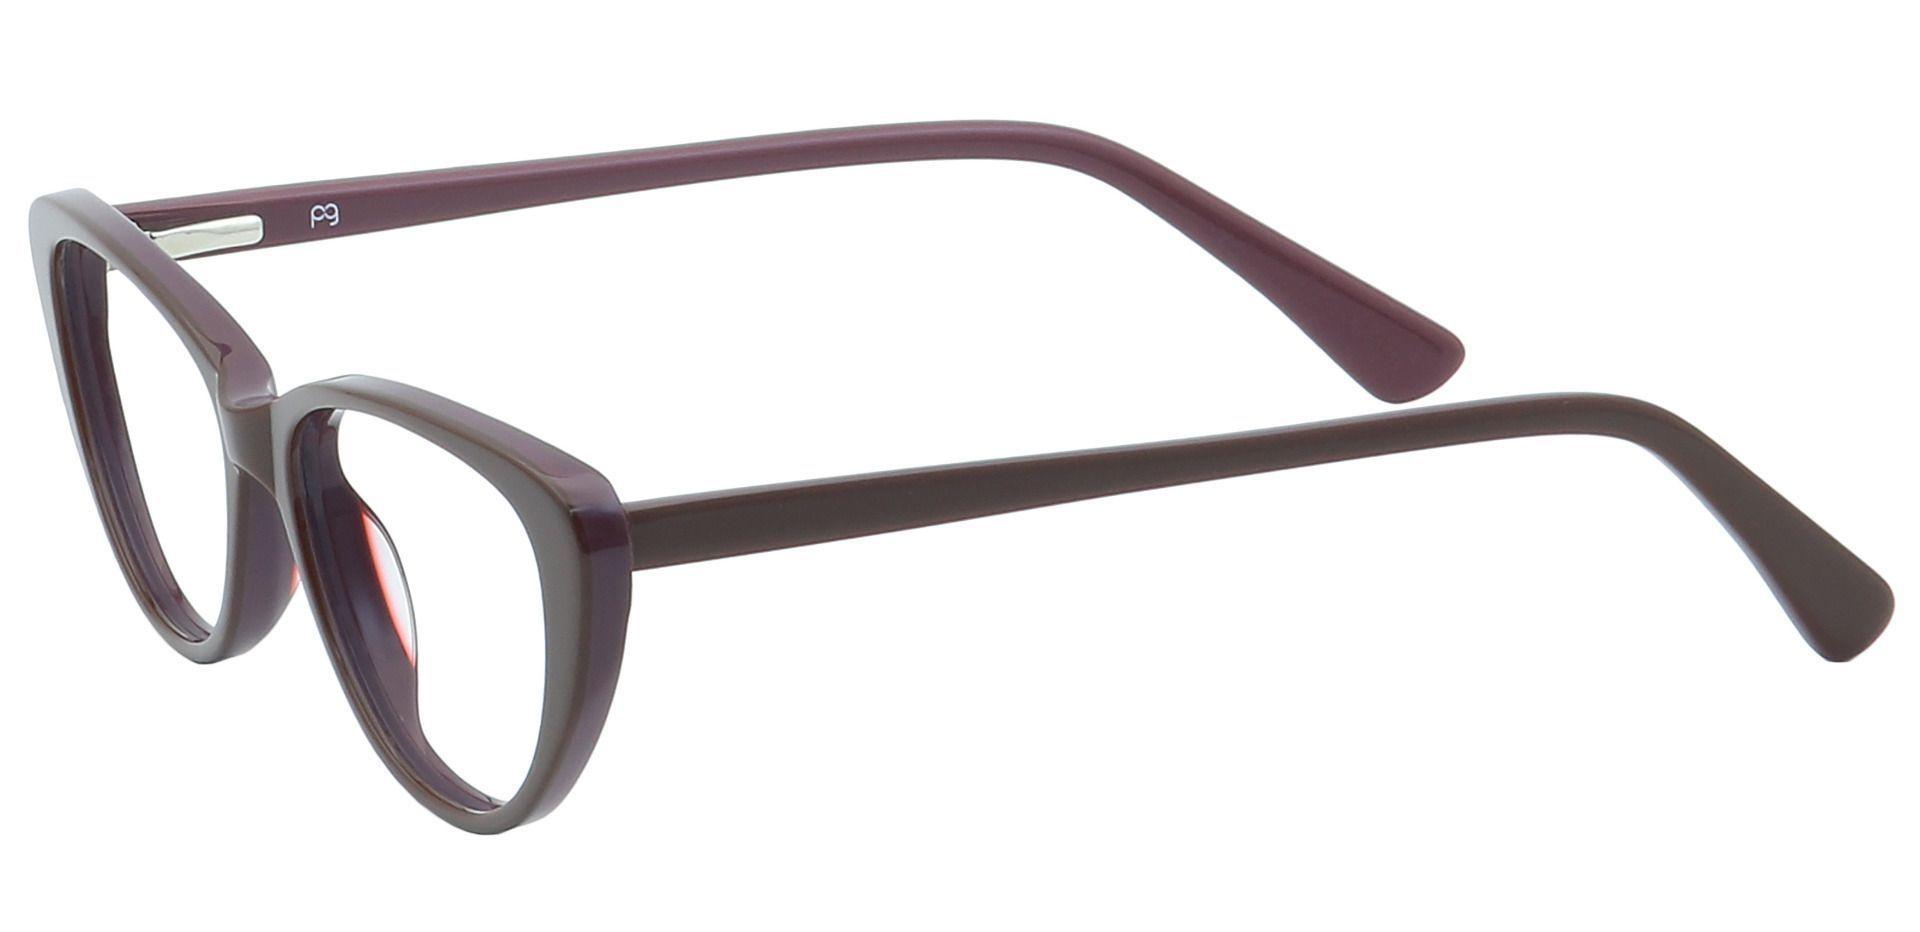 Cacia Cat-Eye Single Vision Glasses - Brown